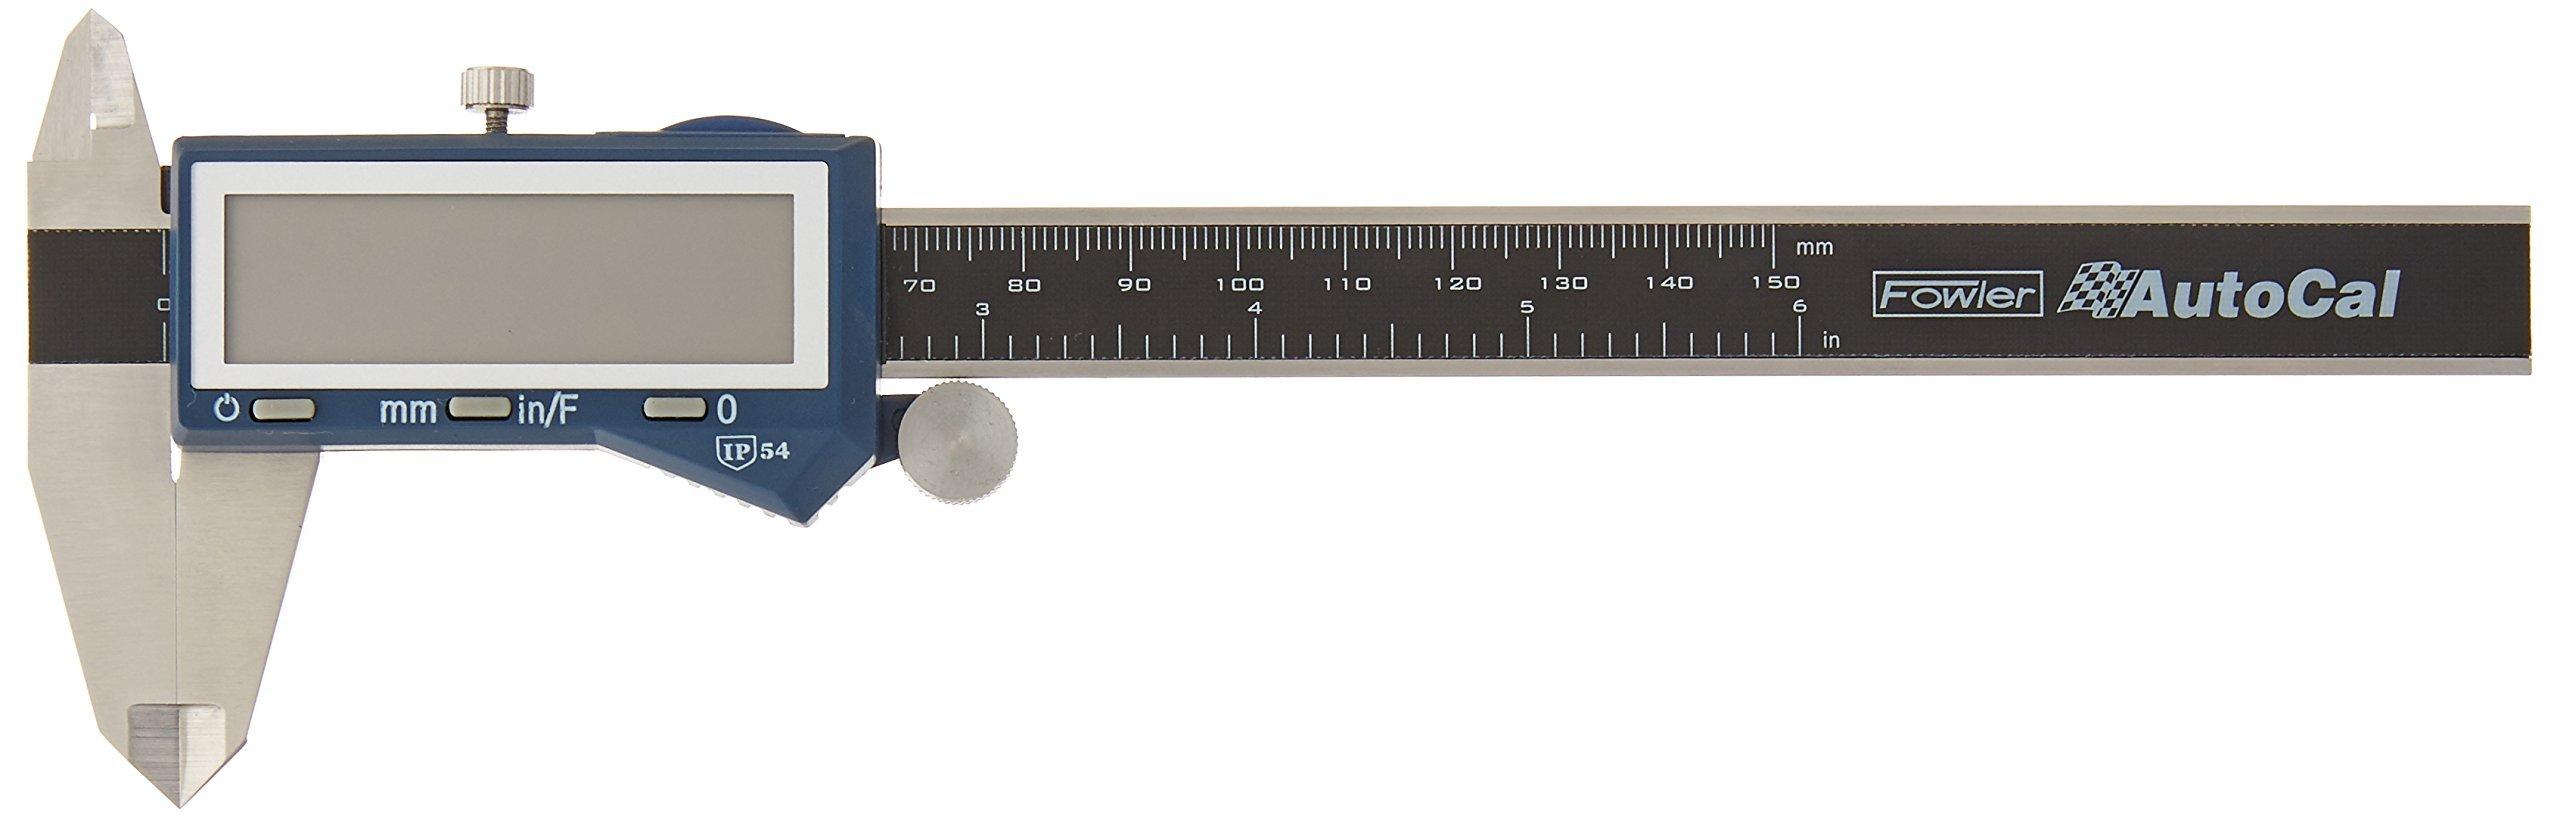 Fowler FOW74-102-006 Electronic Caliper (AutoCal 6'' Fractional)